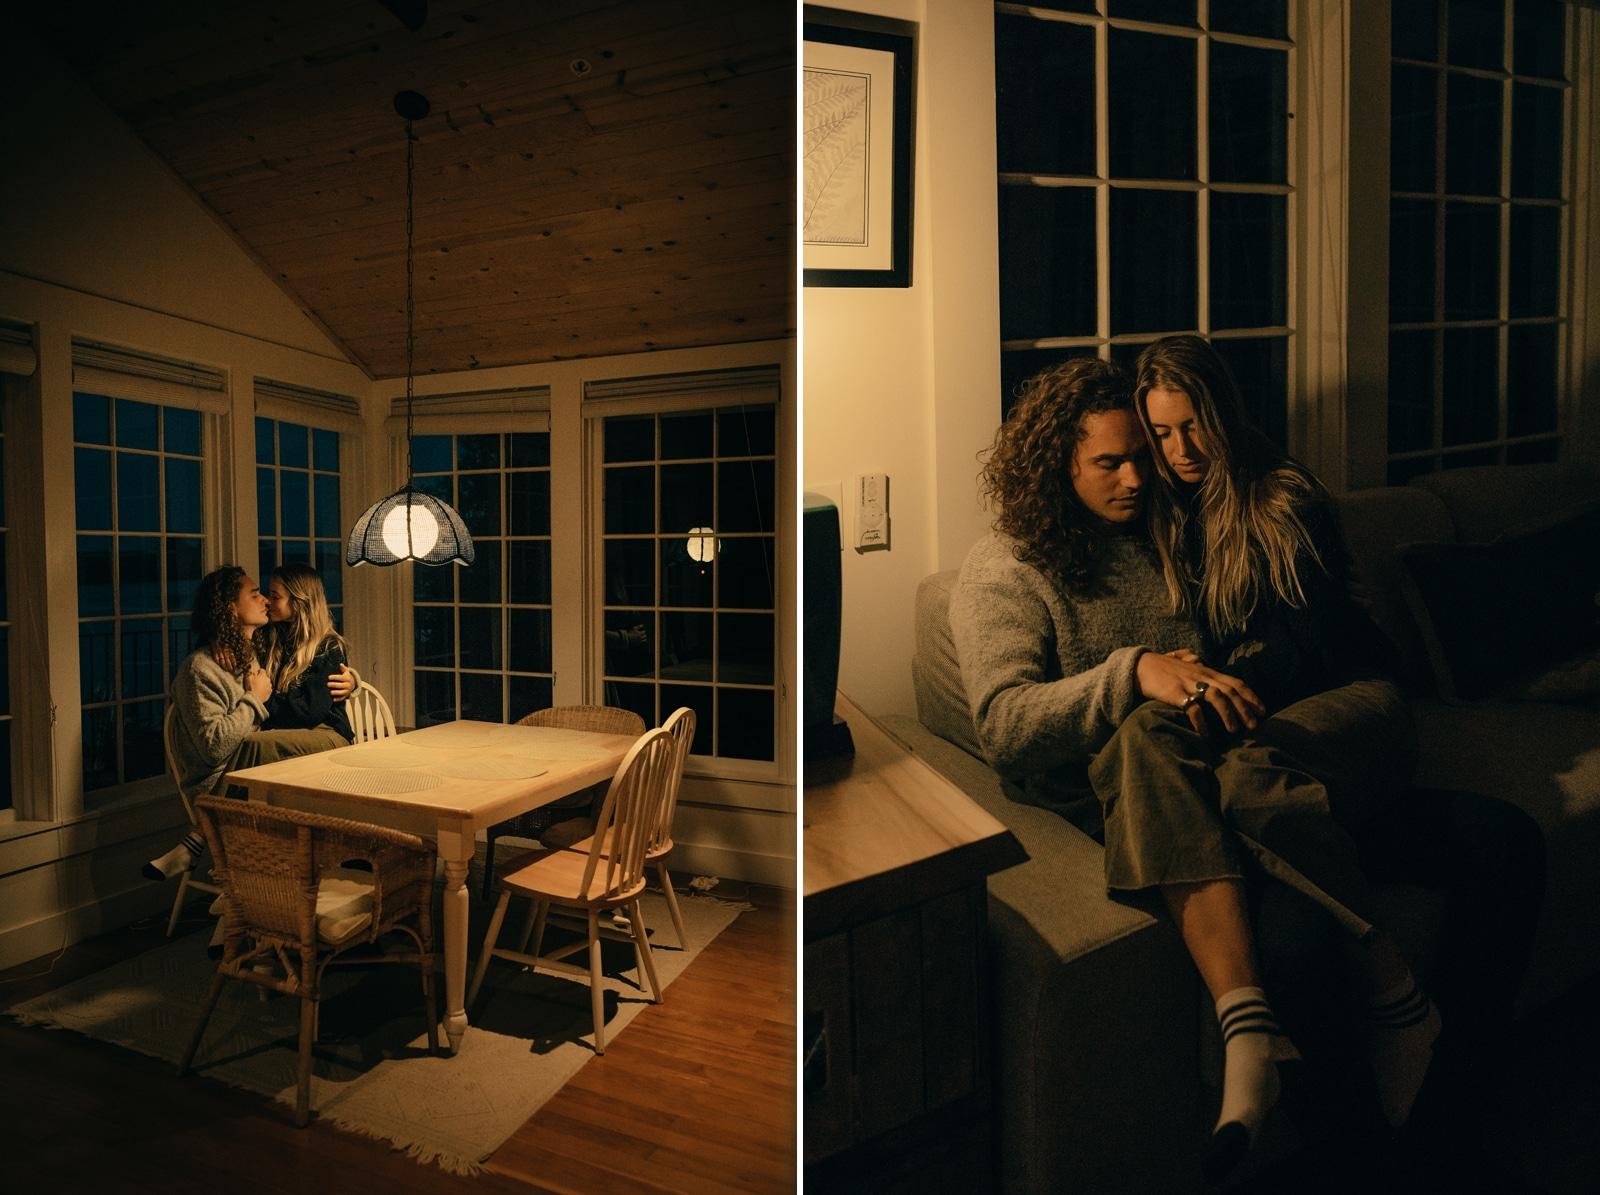 091-intimate-portraits